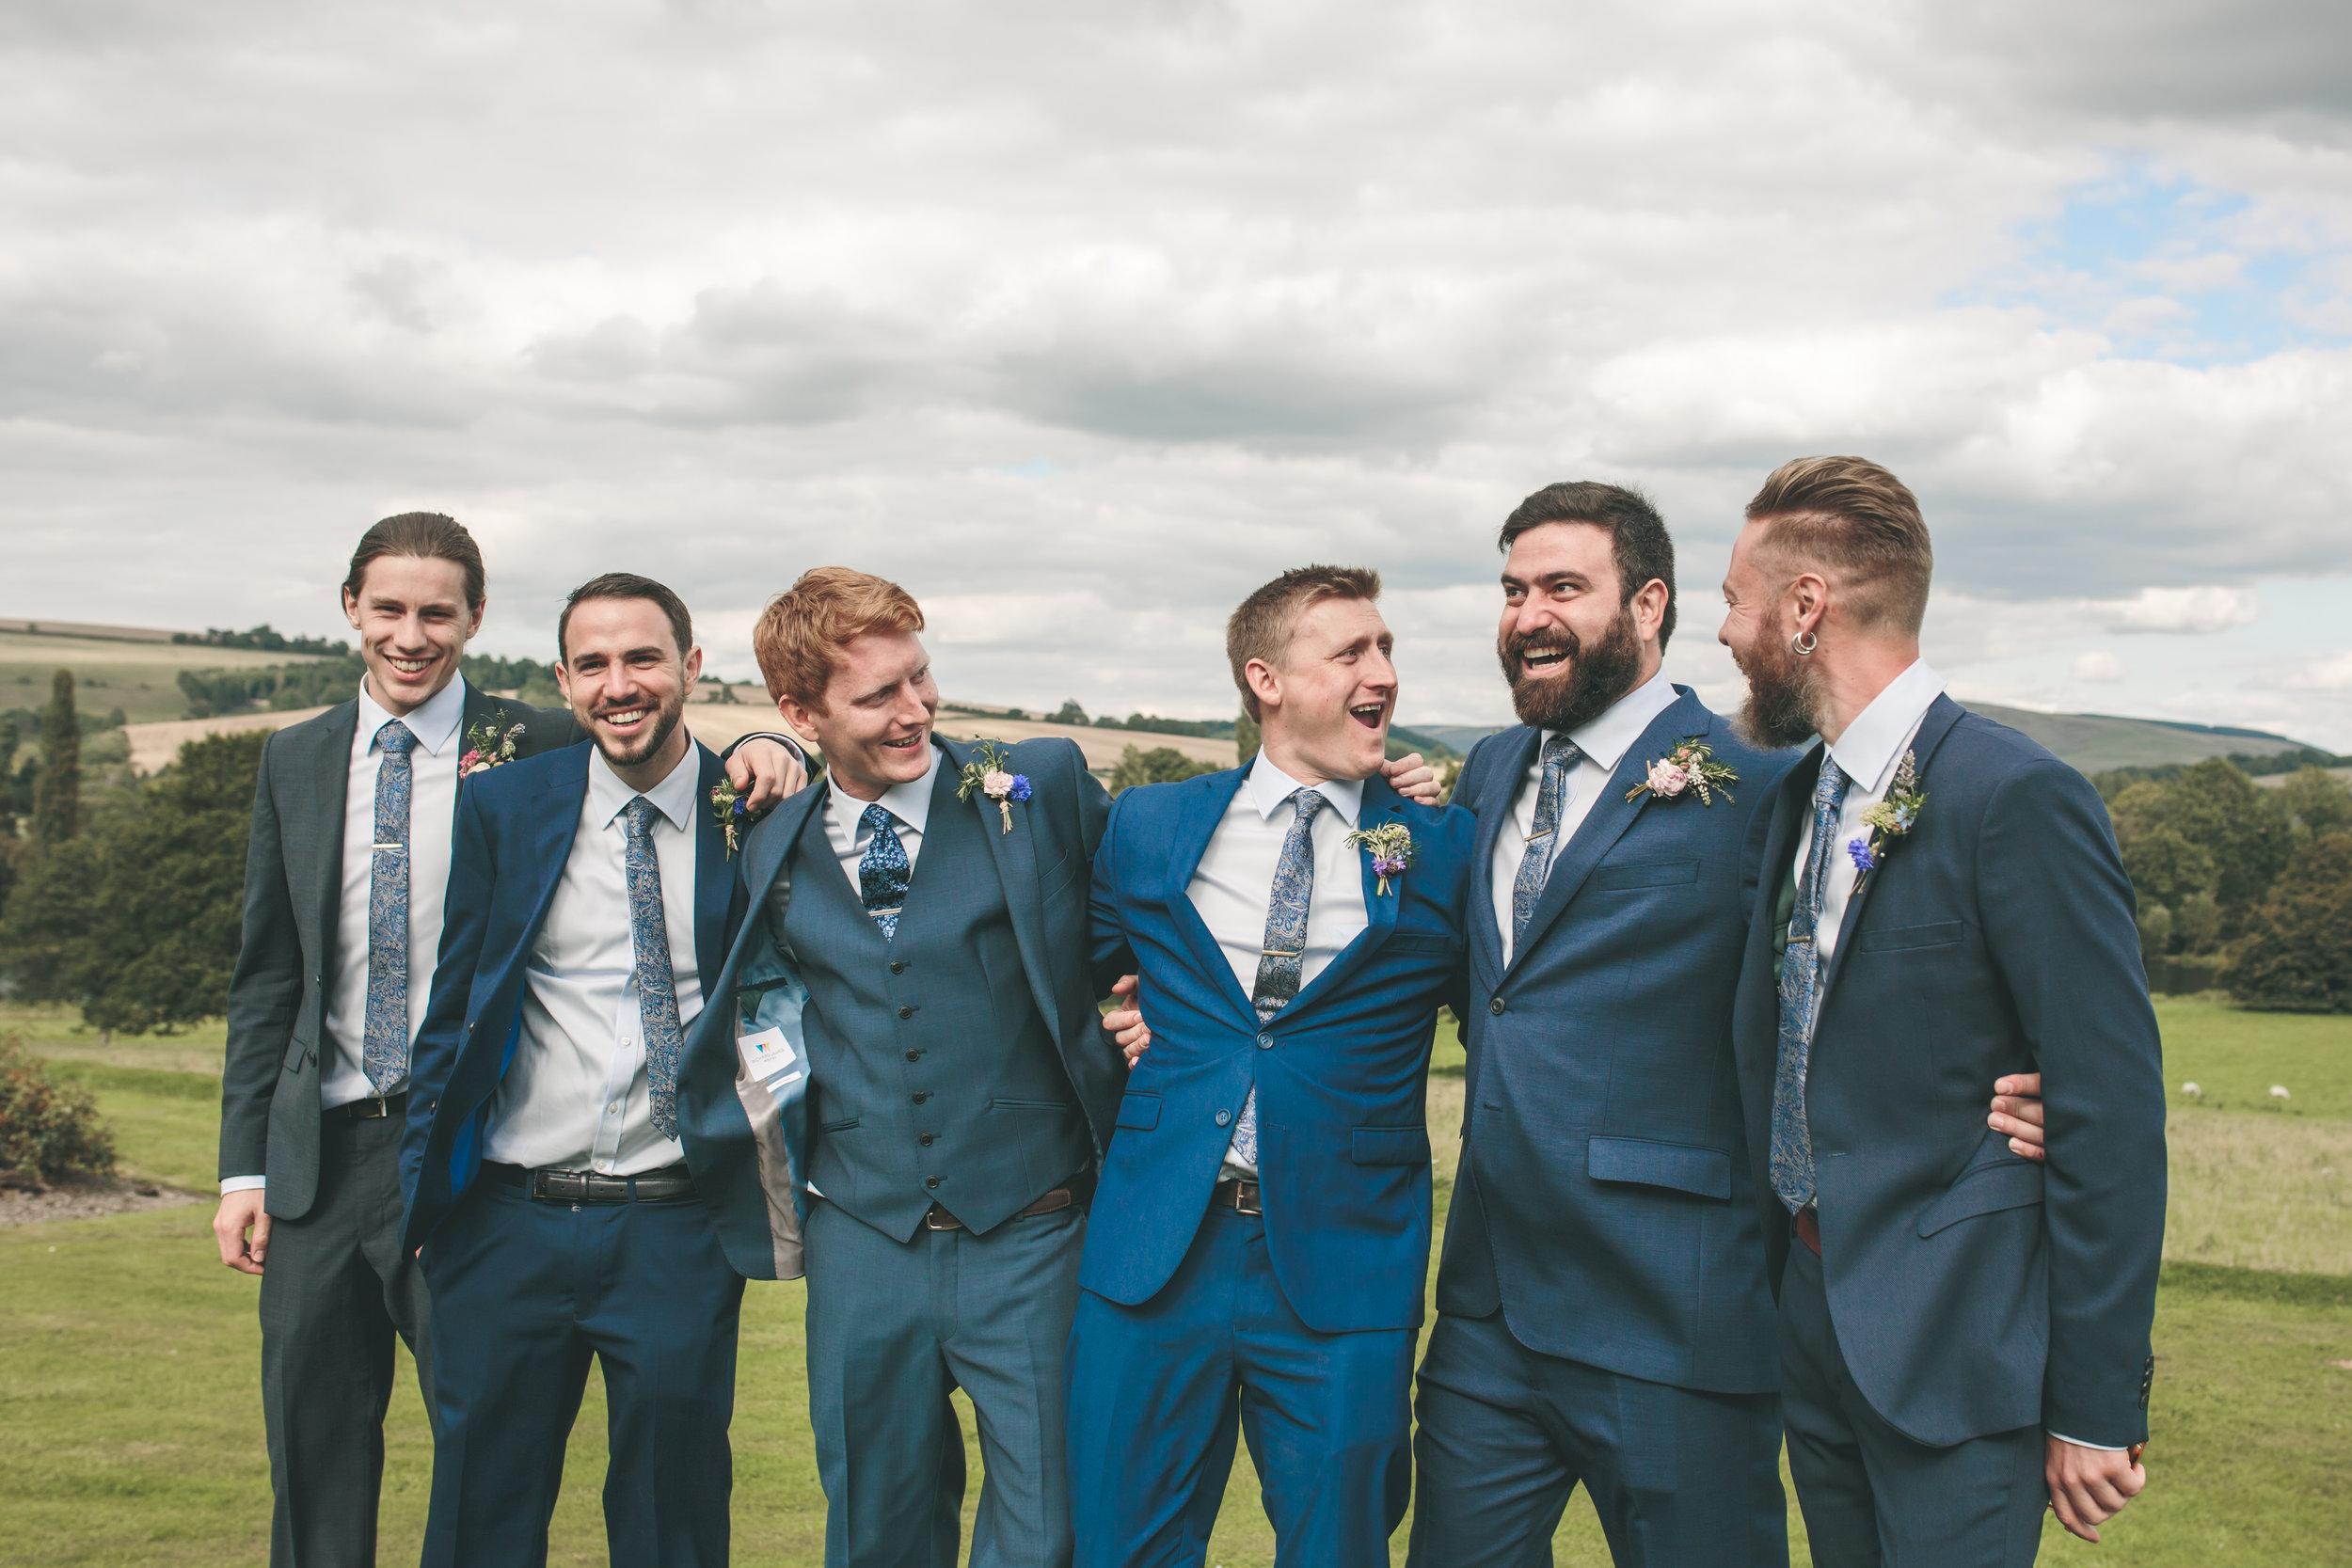 Walcot_Hall_Wedding_Photography_Jesse_Rose_-335.jpg